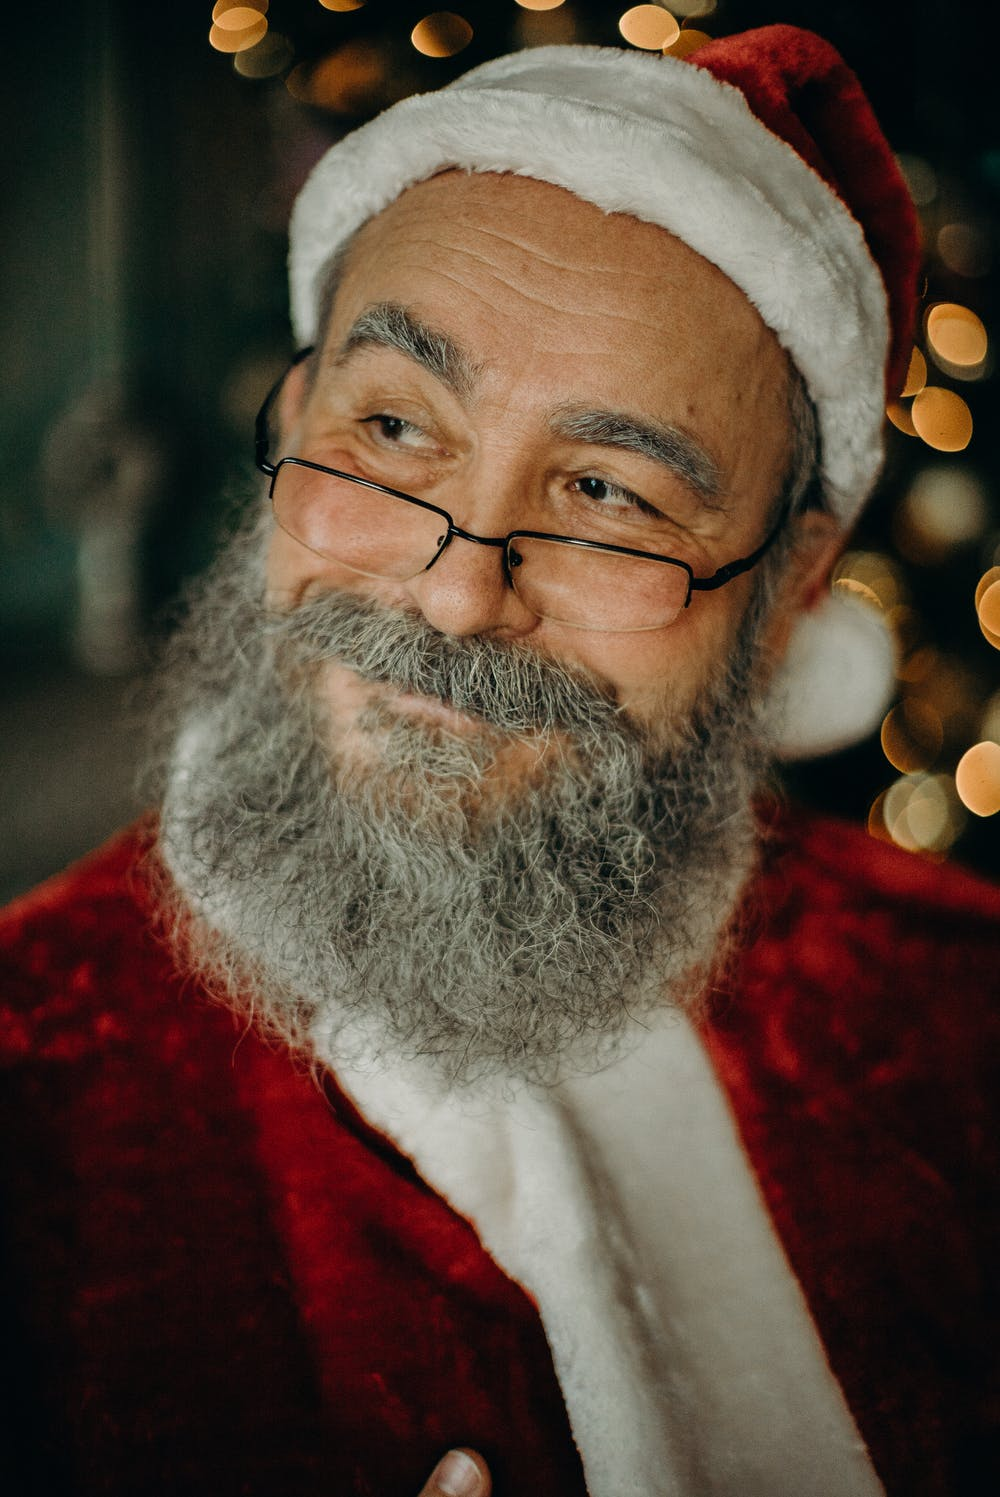 Man in a Santa Claus costume. | Photo: Pexels